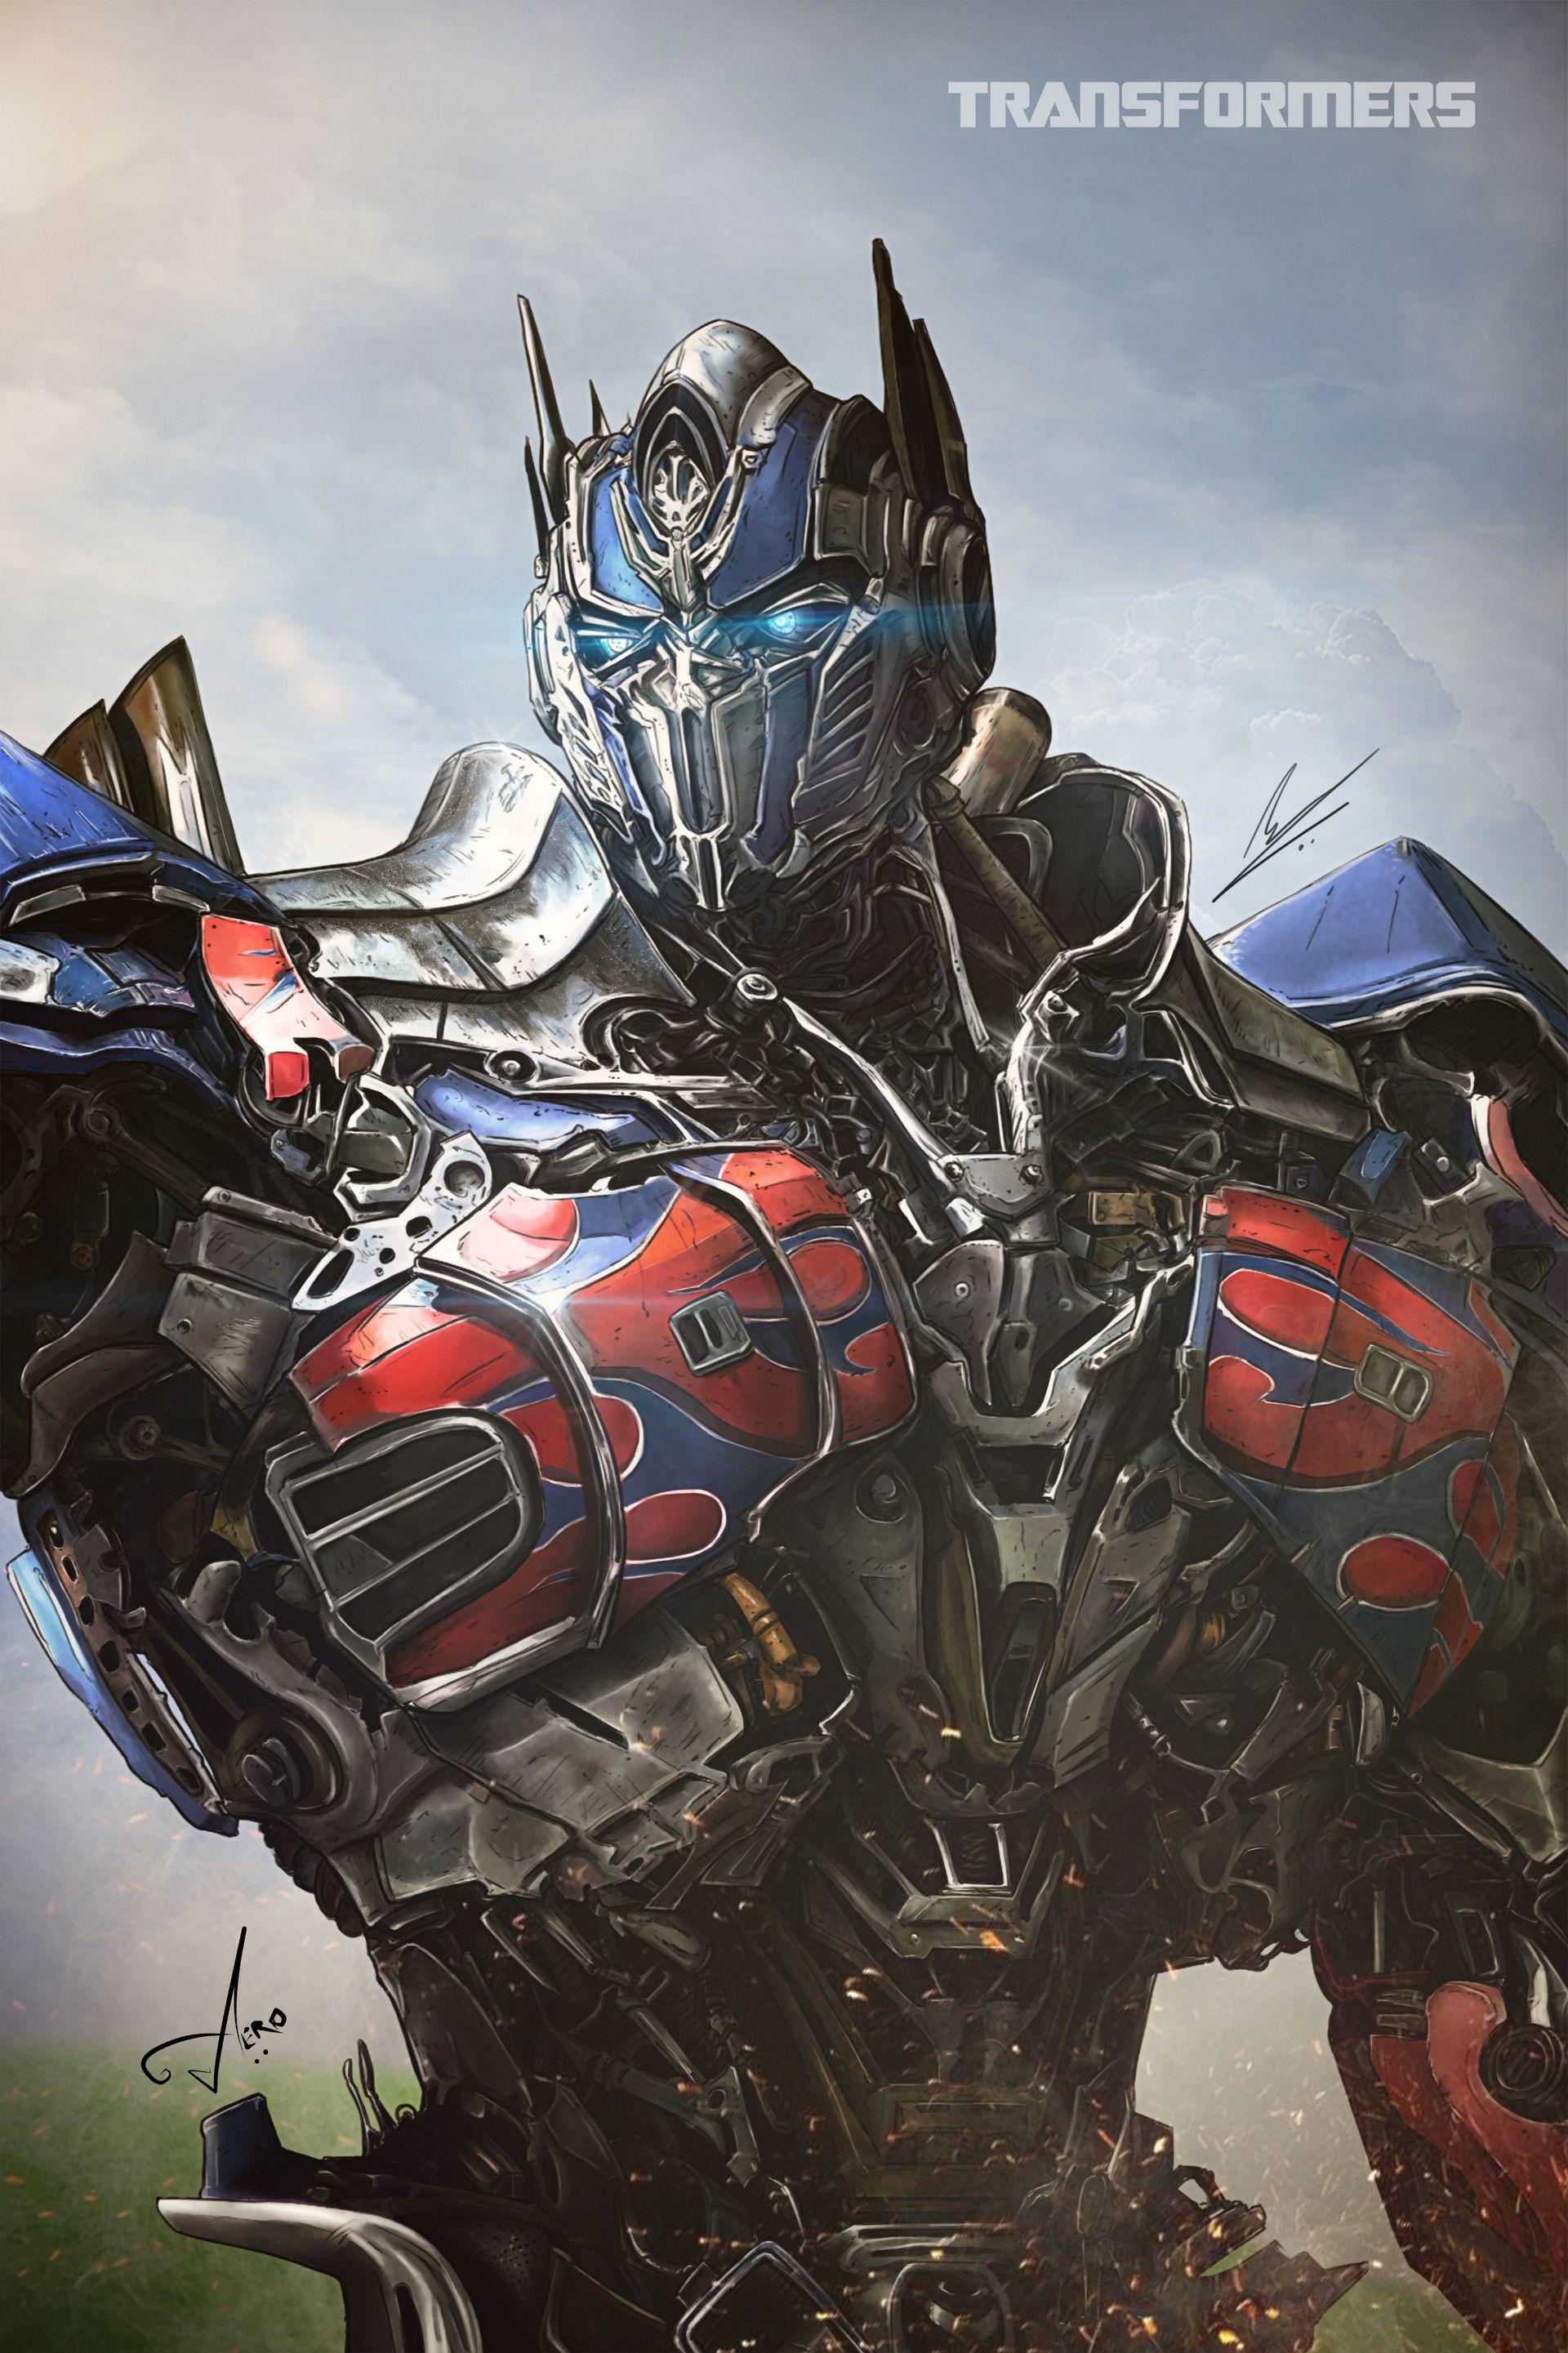 ArtStation - Optimus Prime Digital Painting, Saif Zulfiqar